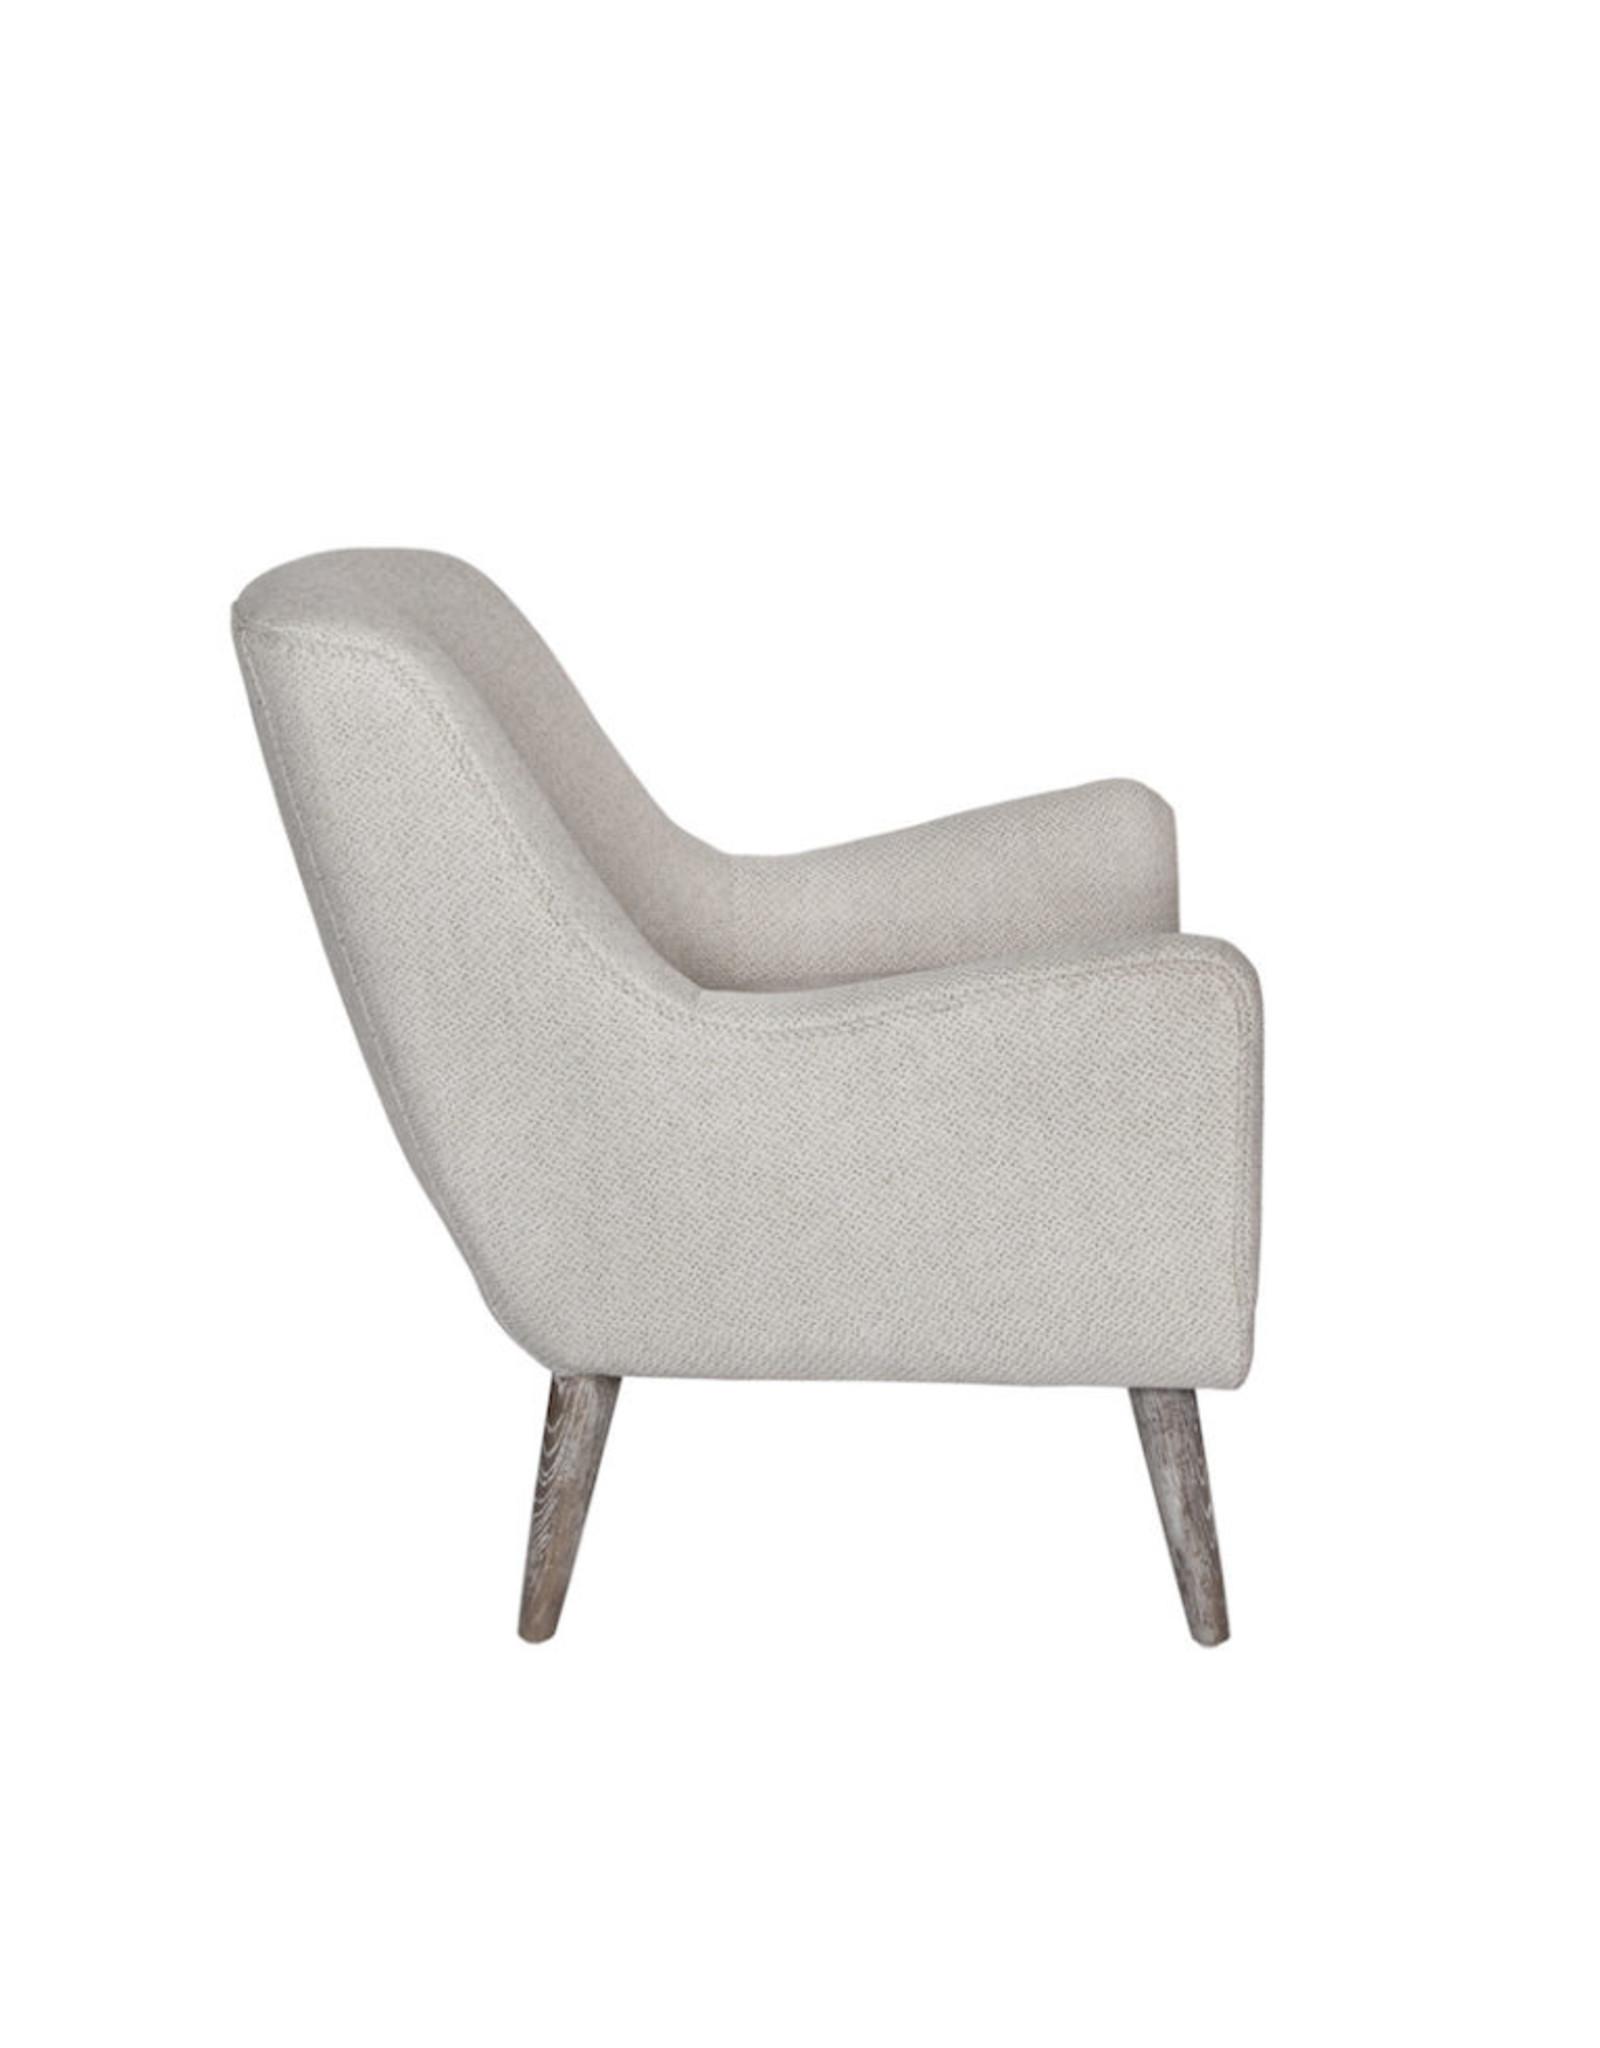 TCE Scoripius Chair Oatmeal